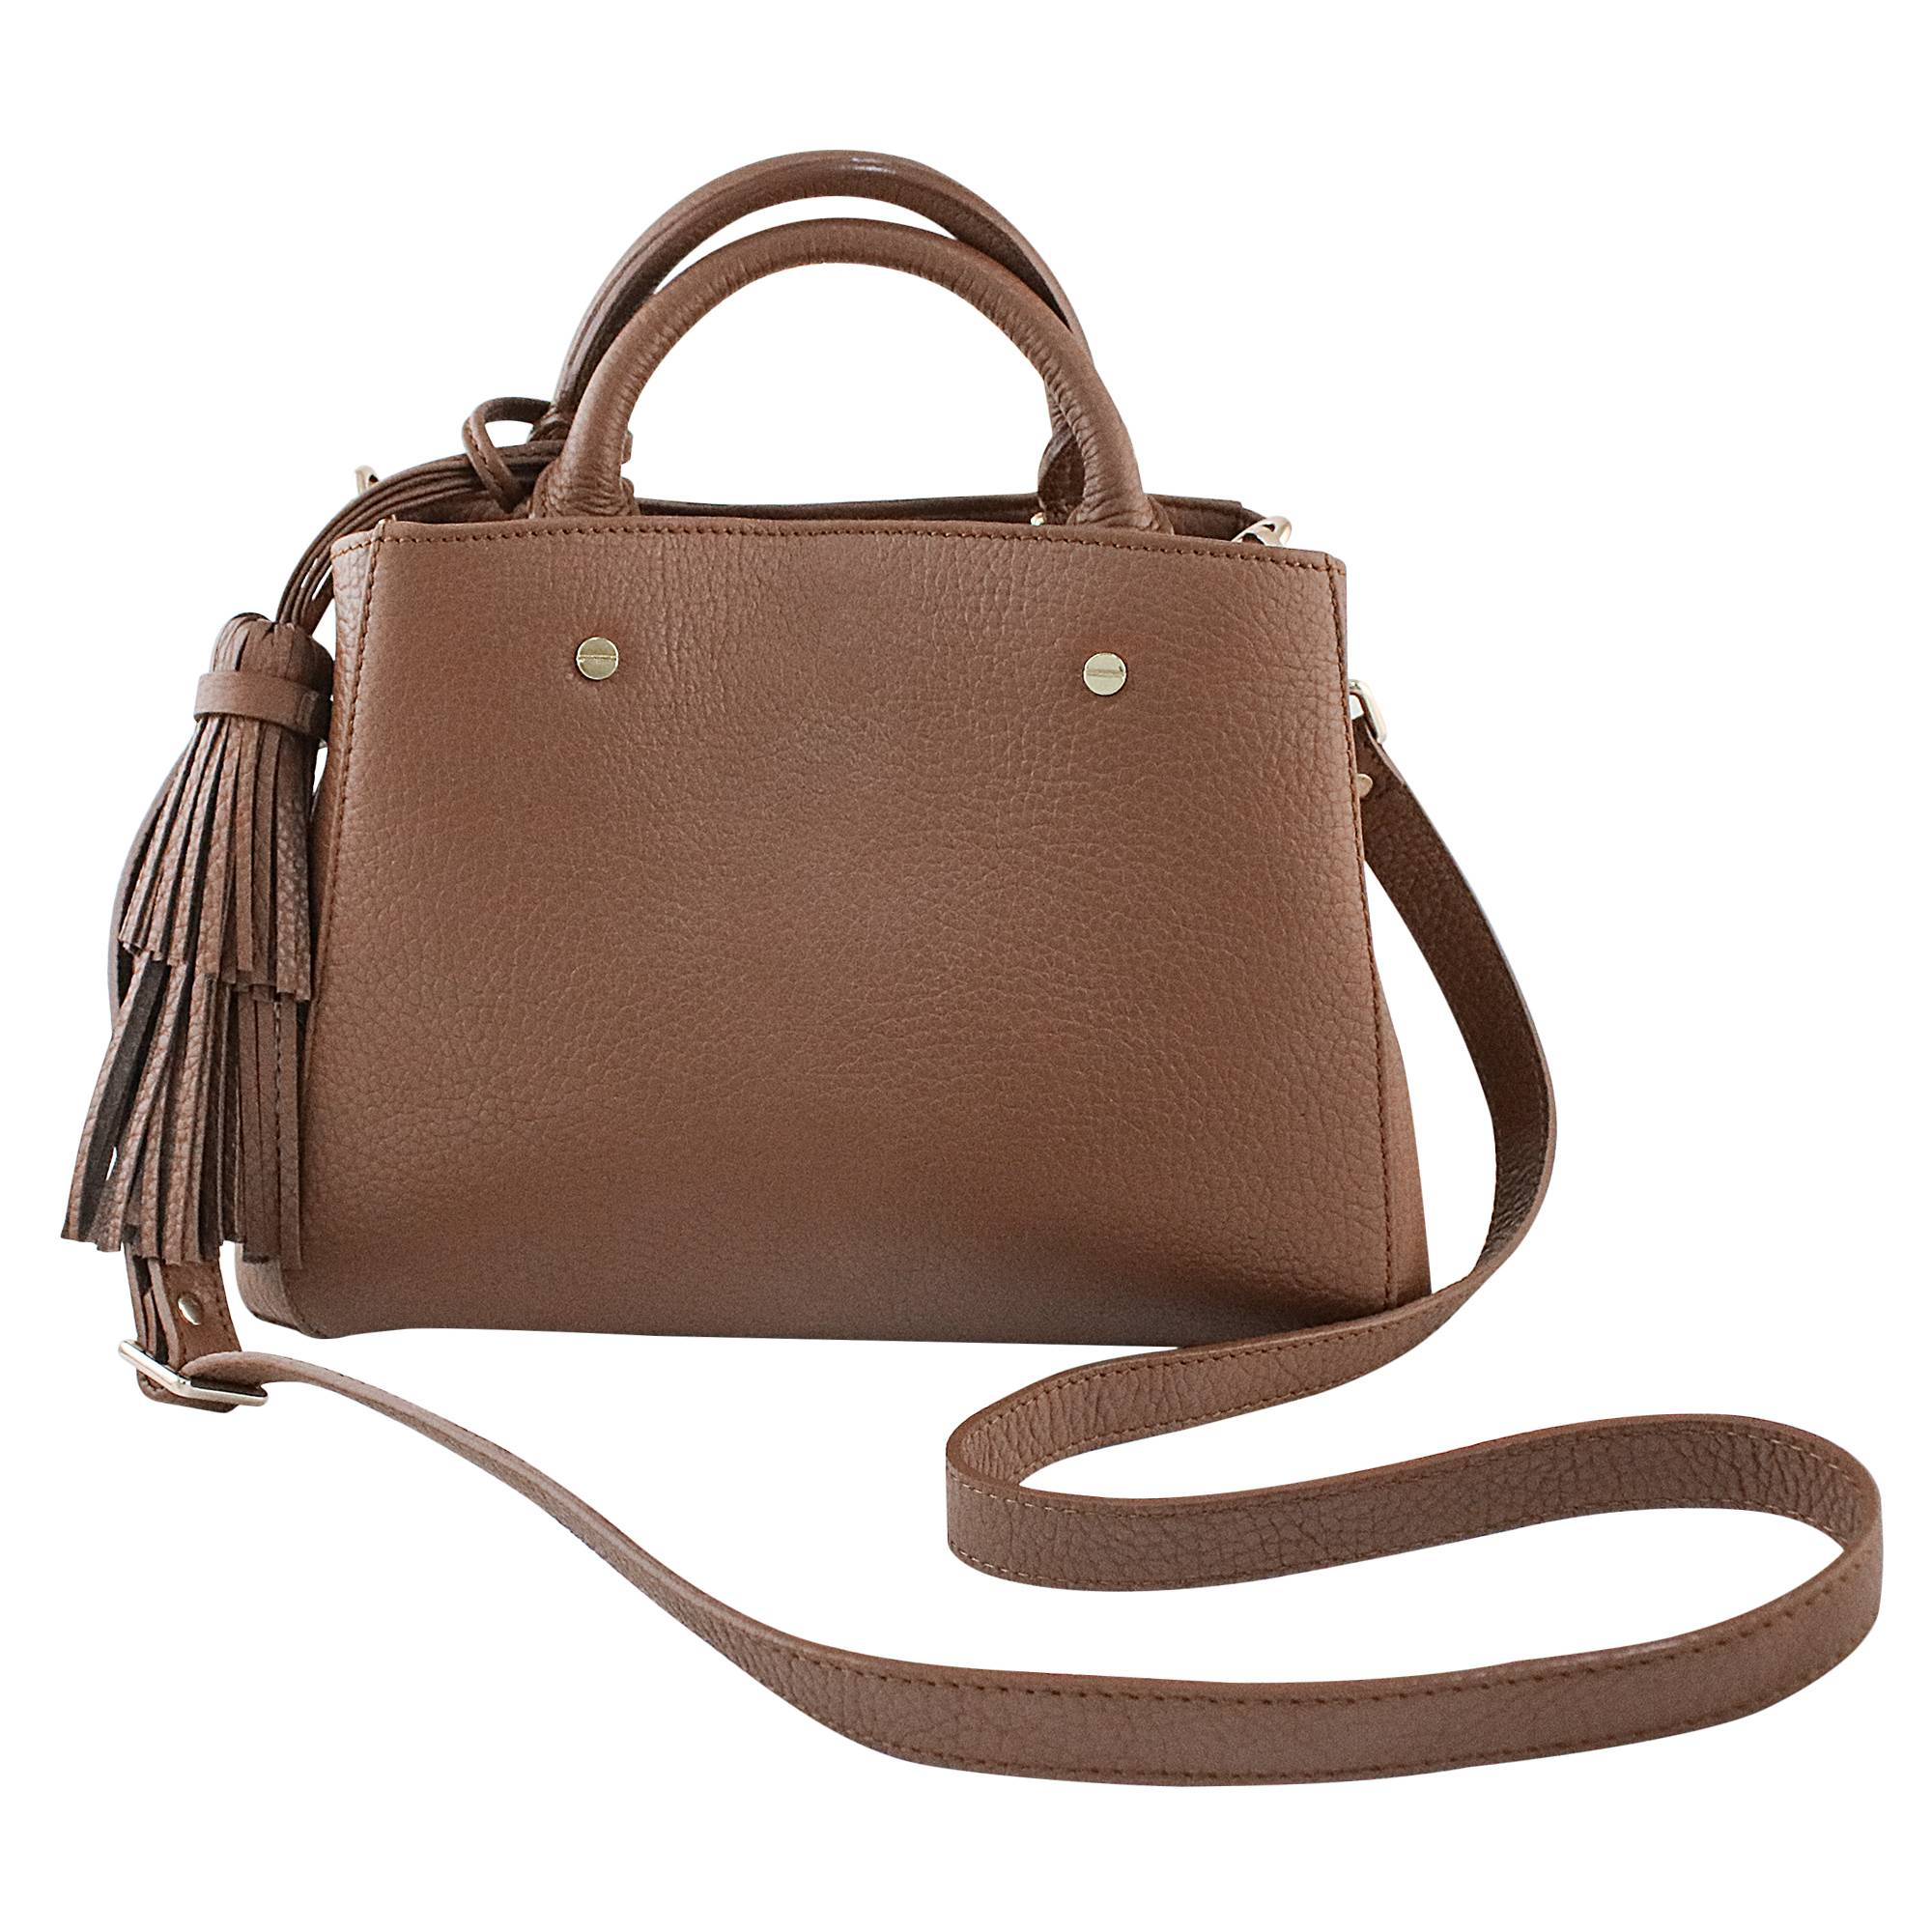 Novica Leather sling, Espresso Chic